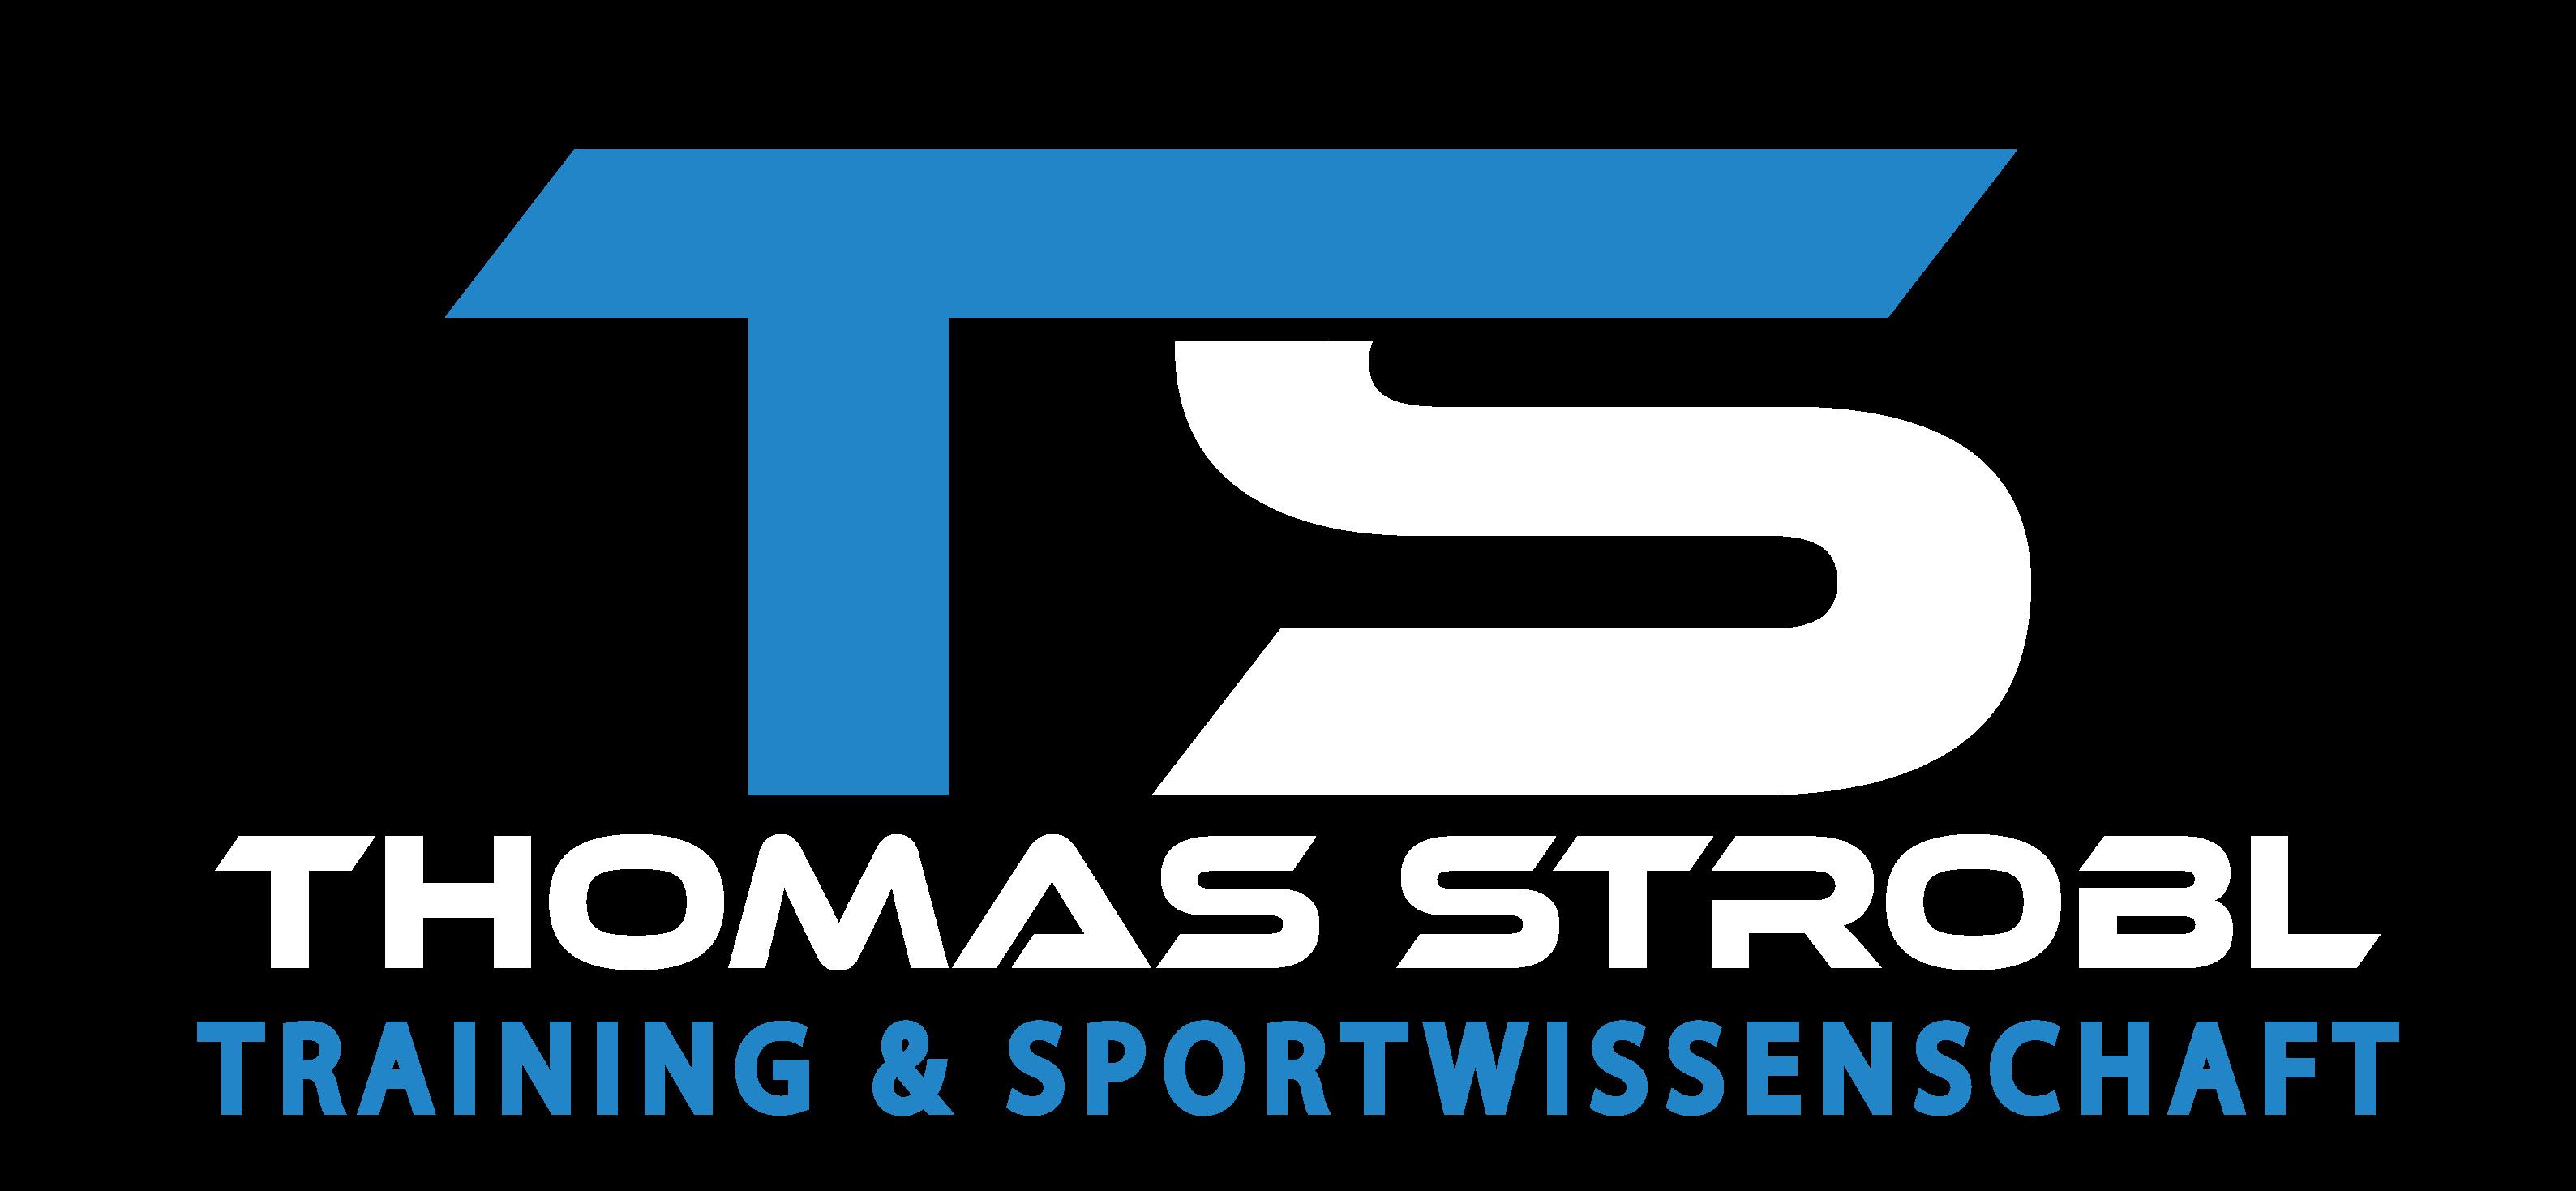 Thomas Strobl – Personal Trainer